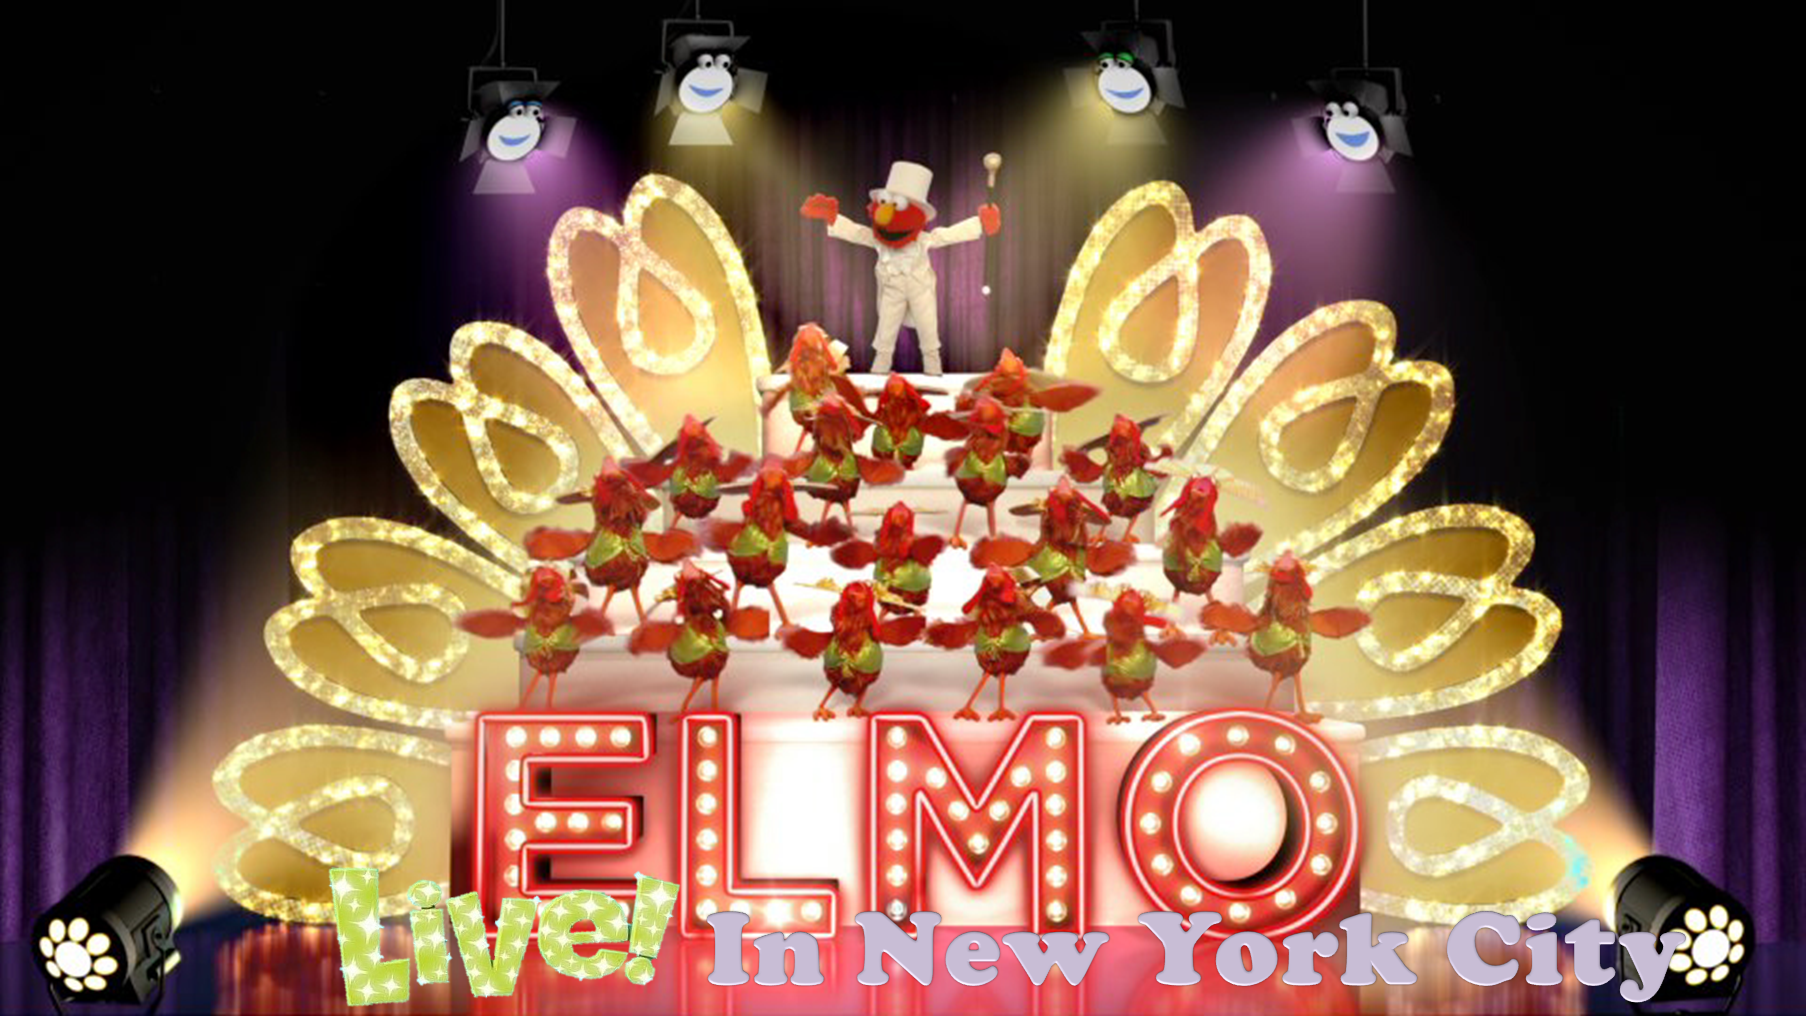 Elmo Live! In New York City